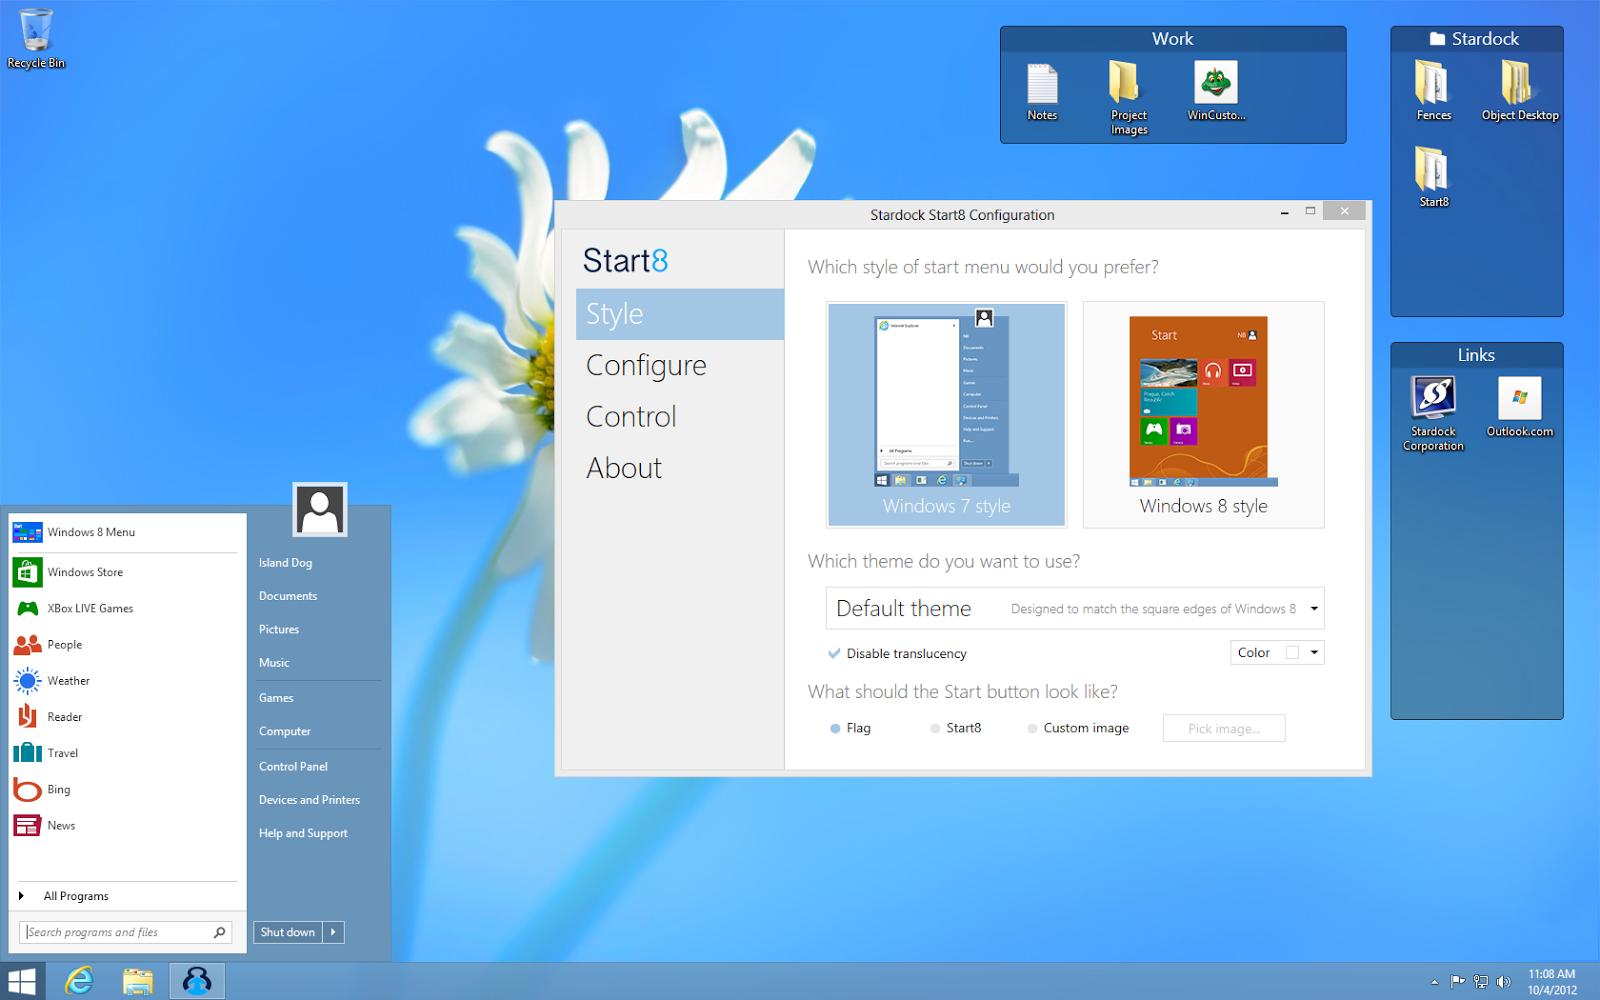 Servicemaxx Keygen Download For Windows